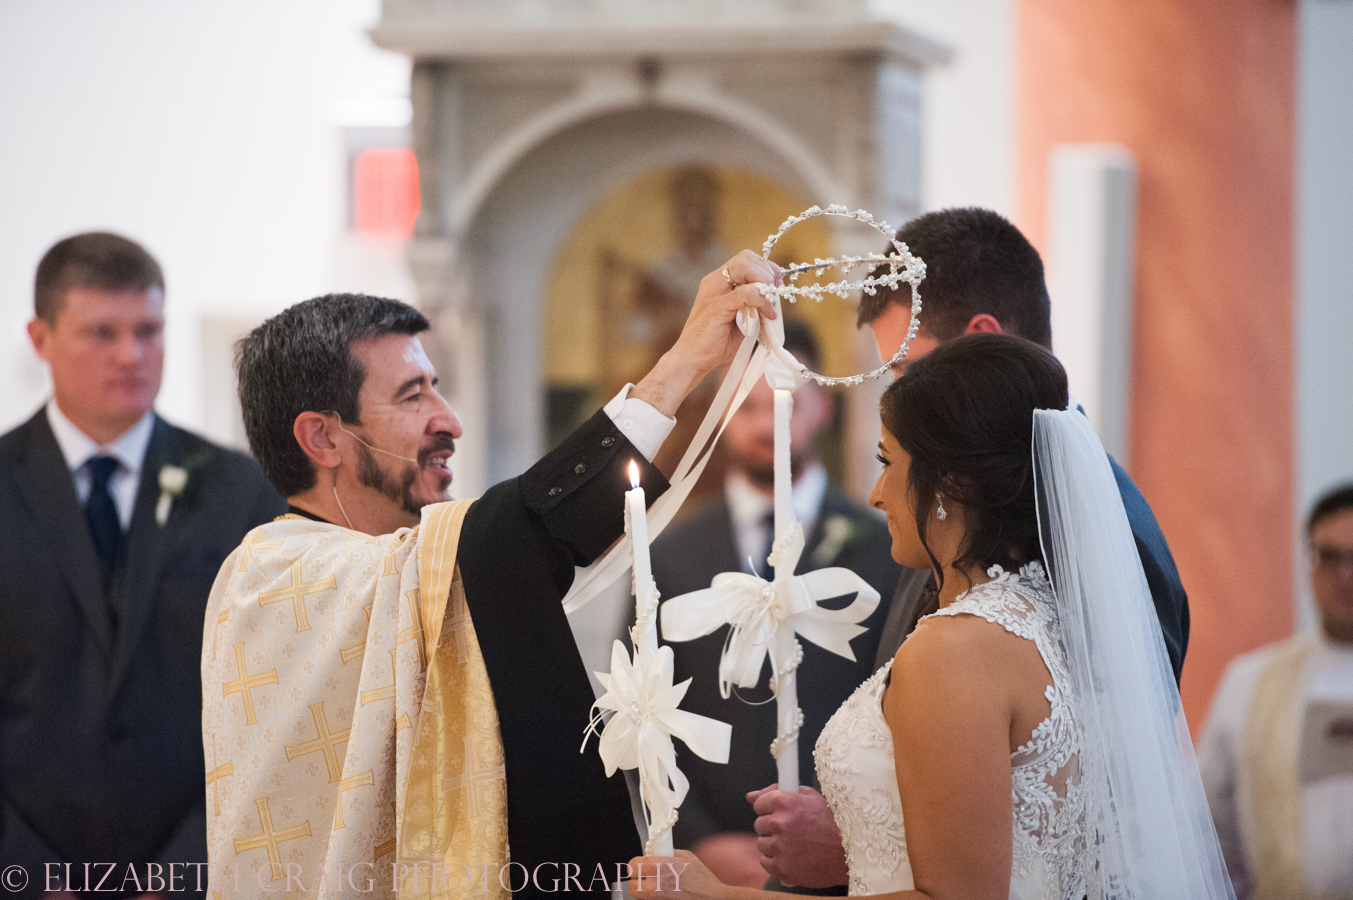 pittsburgh-greek-weddings-fairmont-weddings-receptions-elizabeth-craig-photohgraphy-009